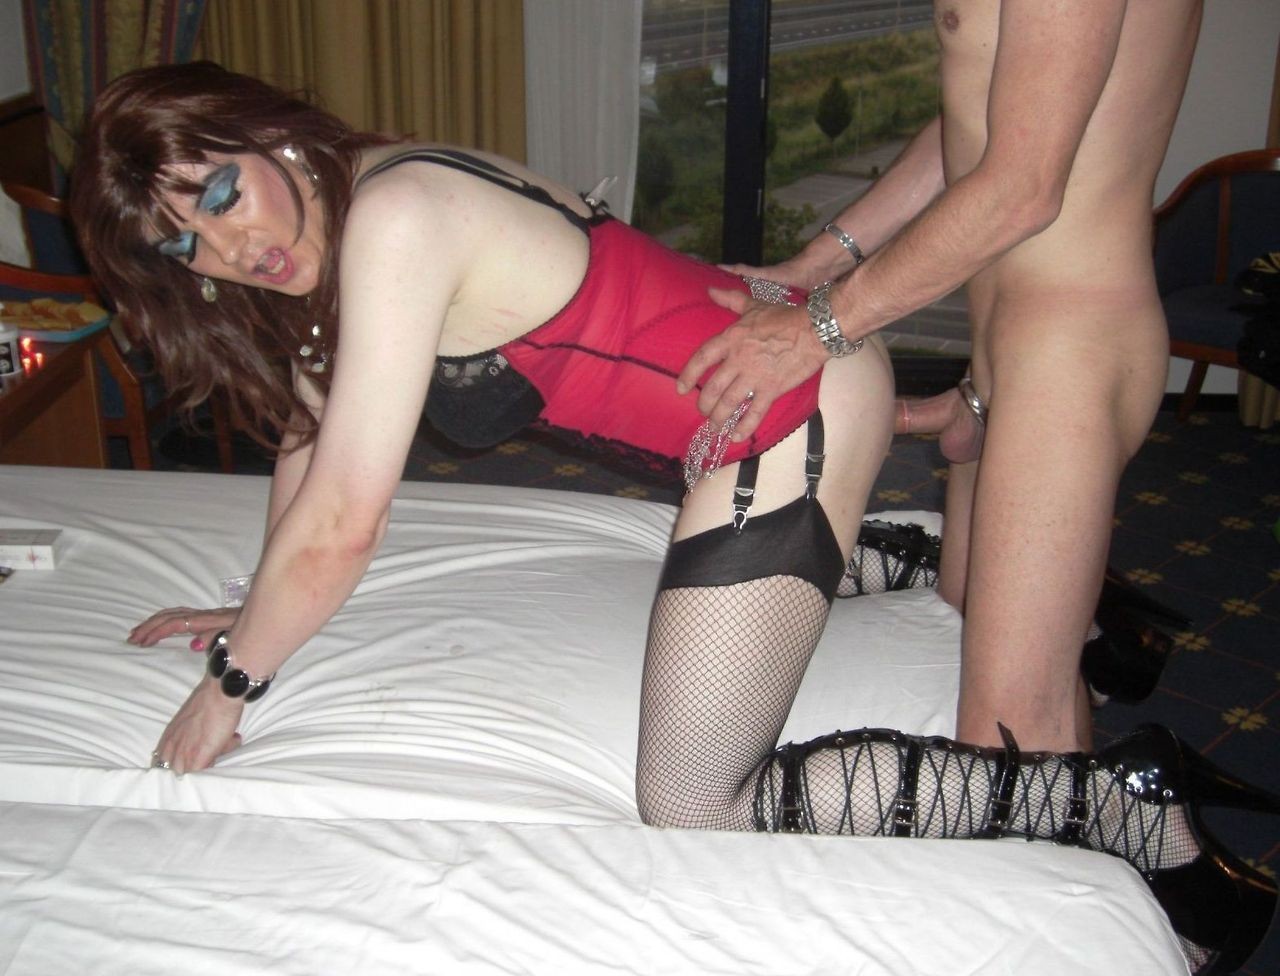 transvestites having sex